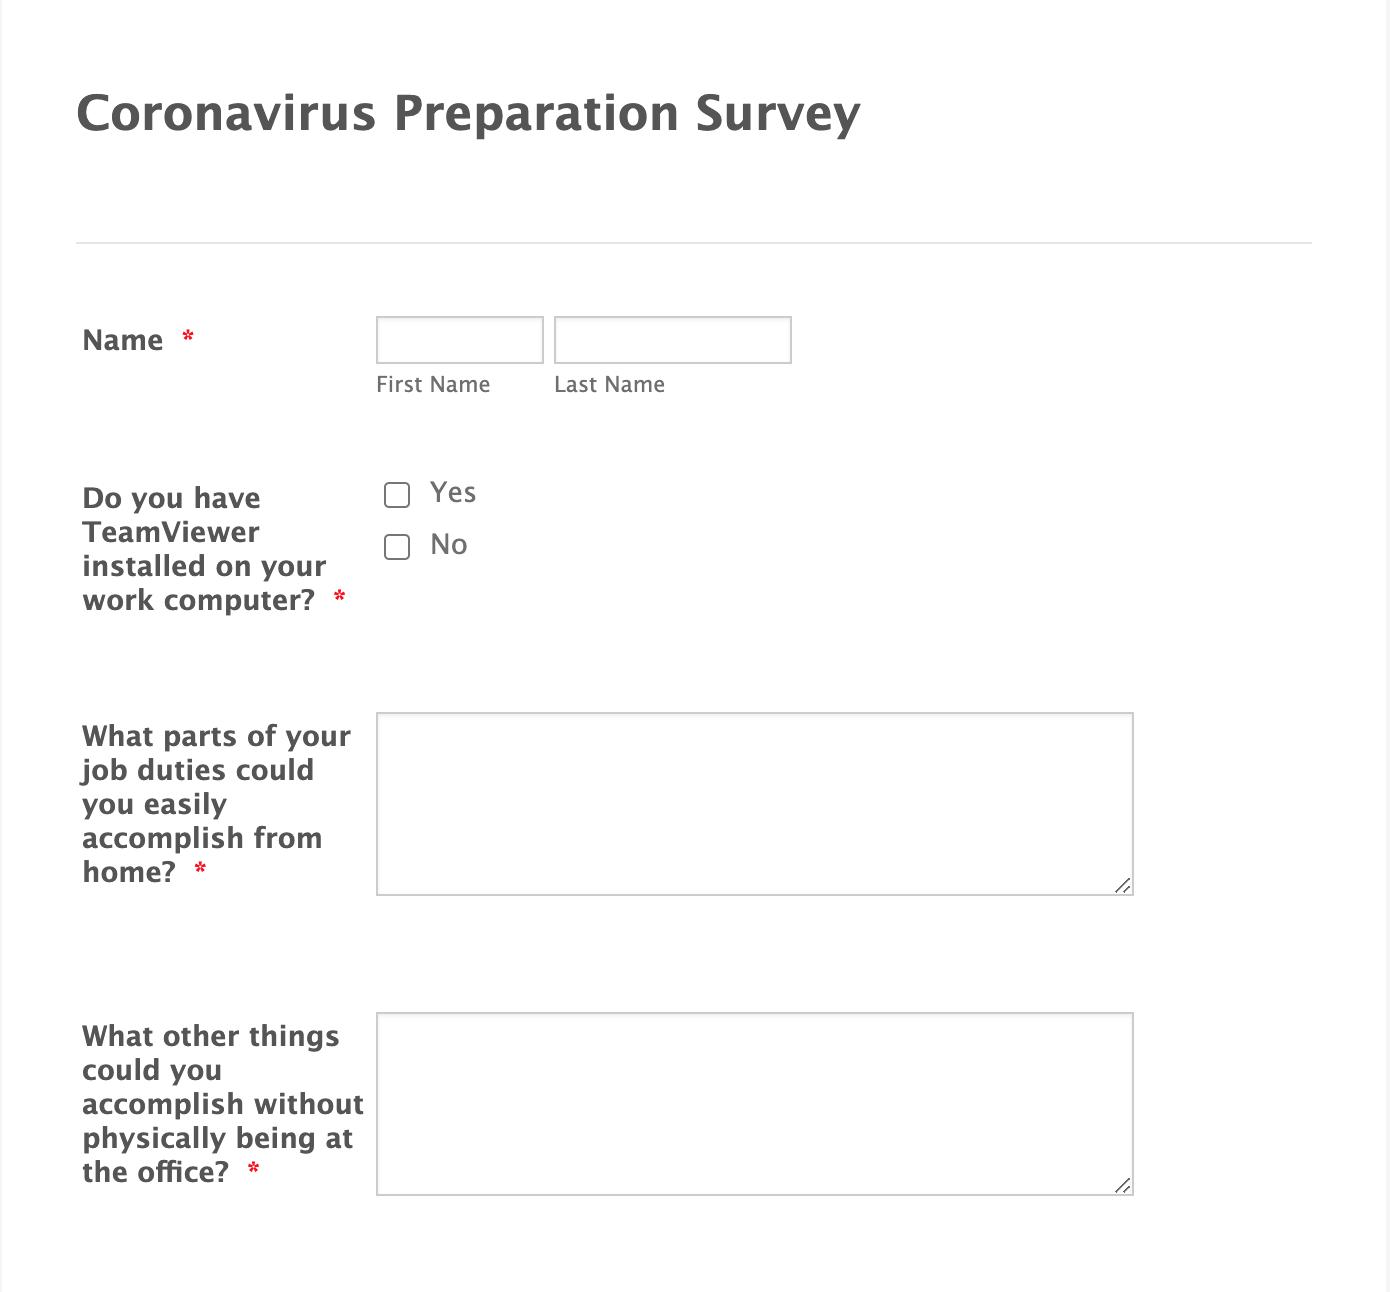 Coronavirus Preparation Survey